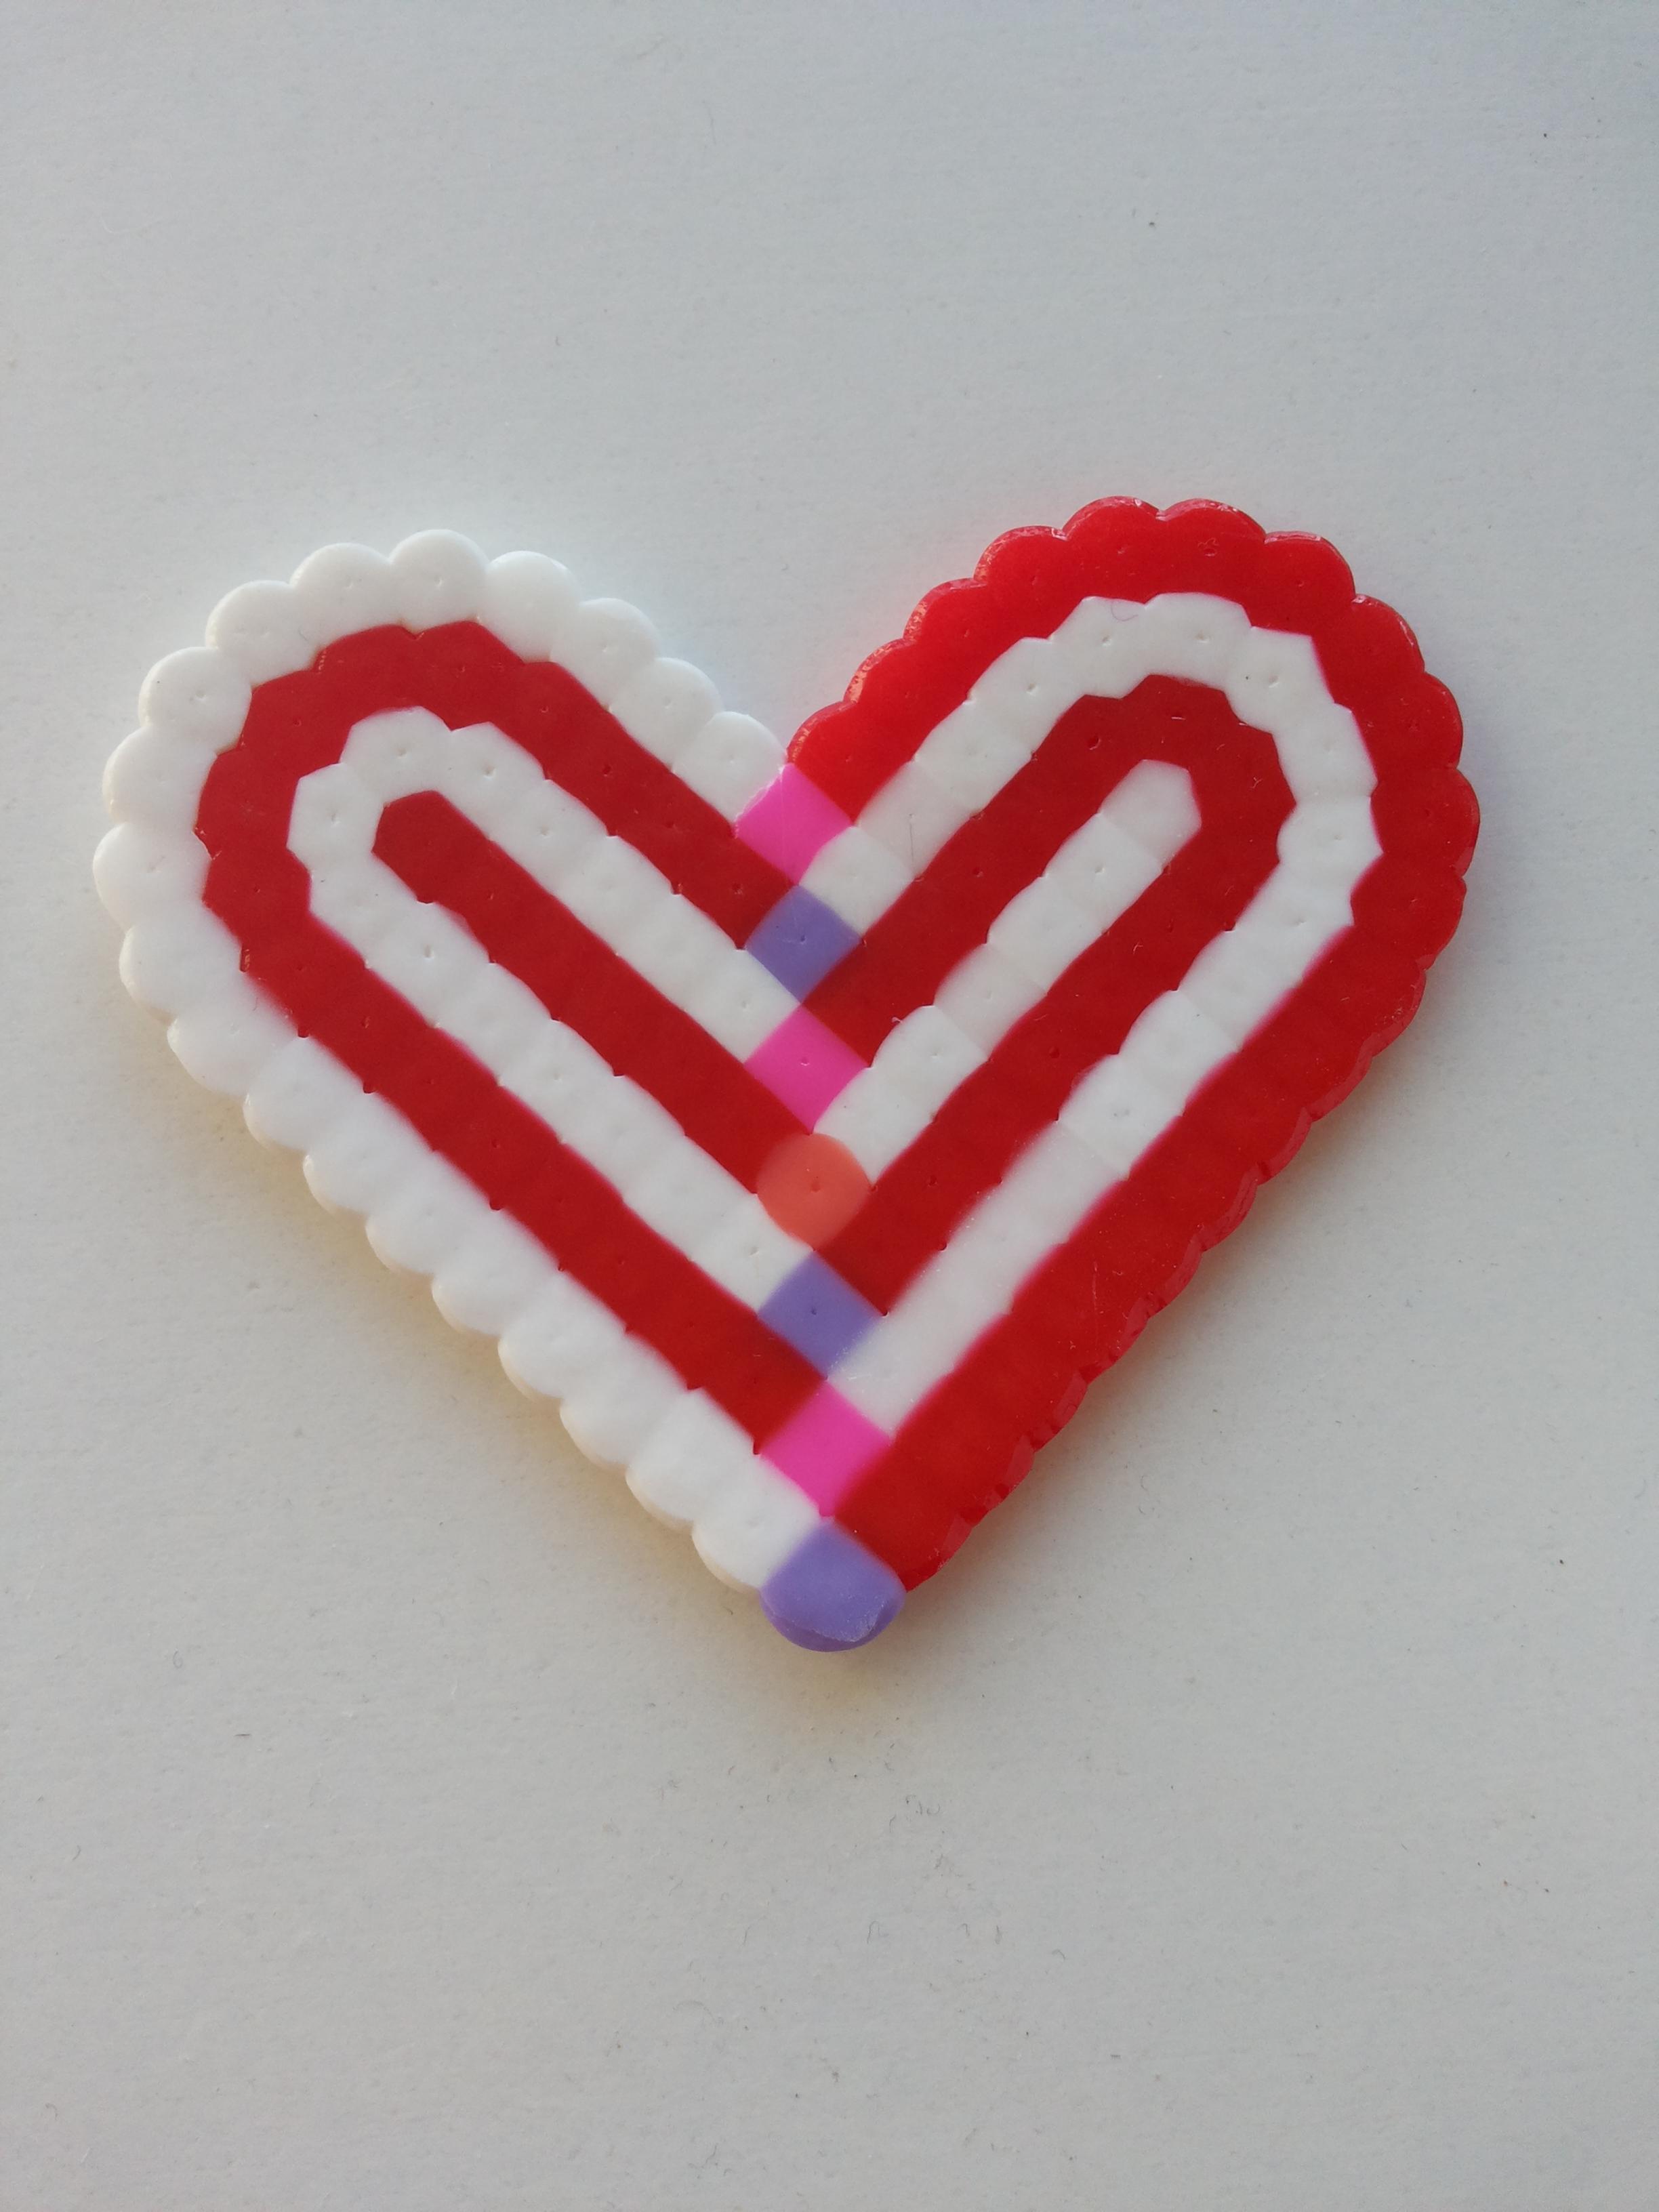 File:Perler bead heart fused side jpg - Wikimedia Commons